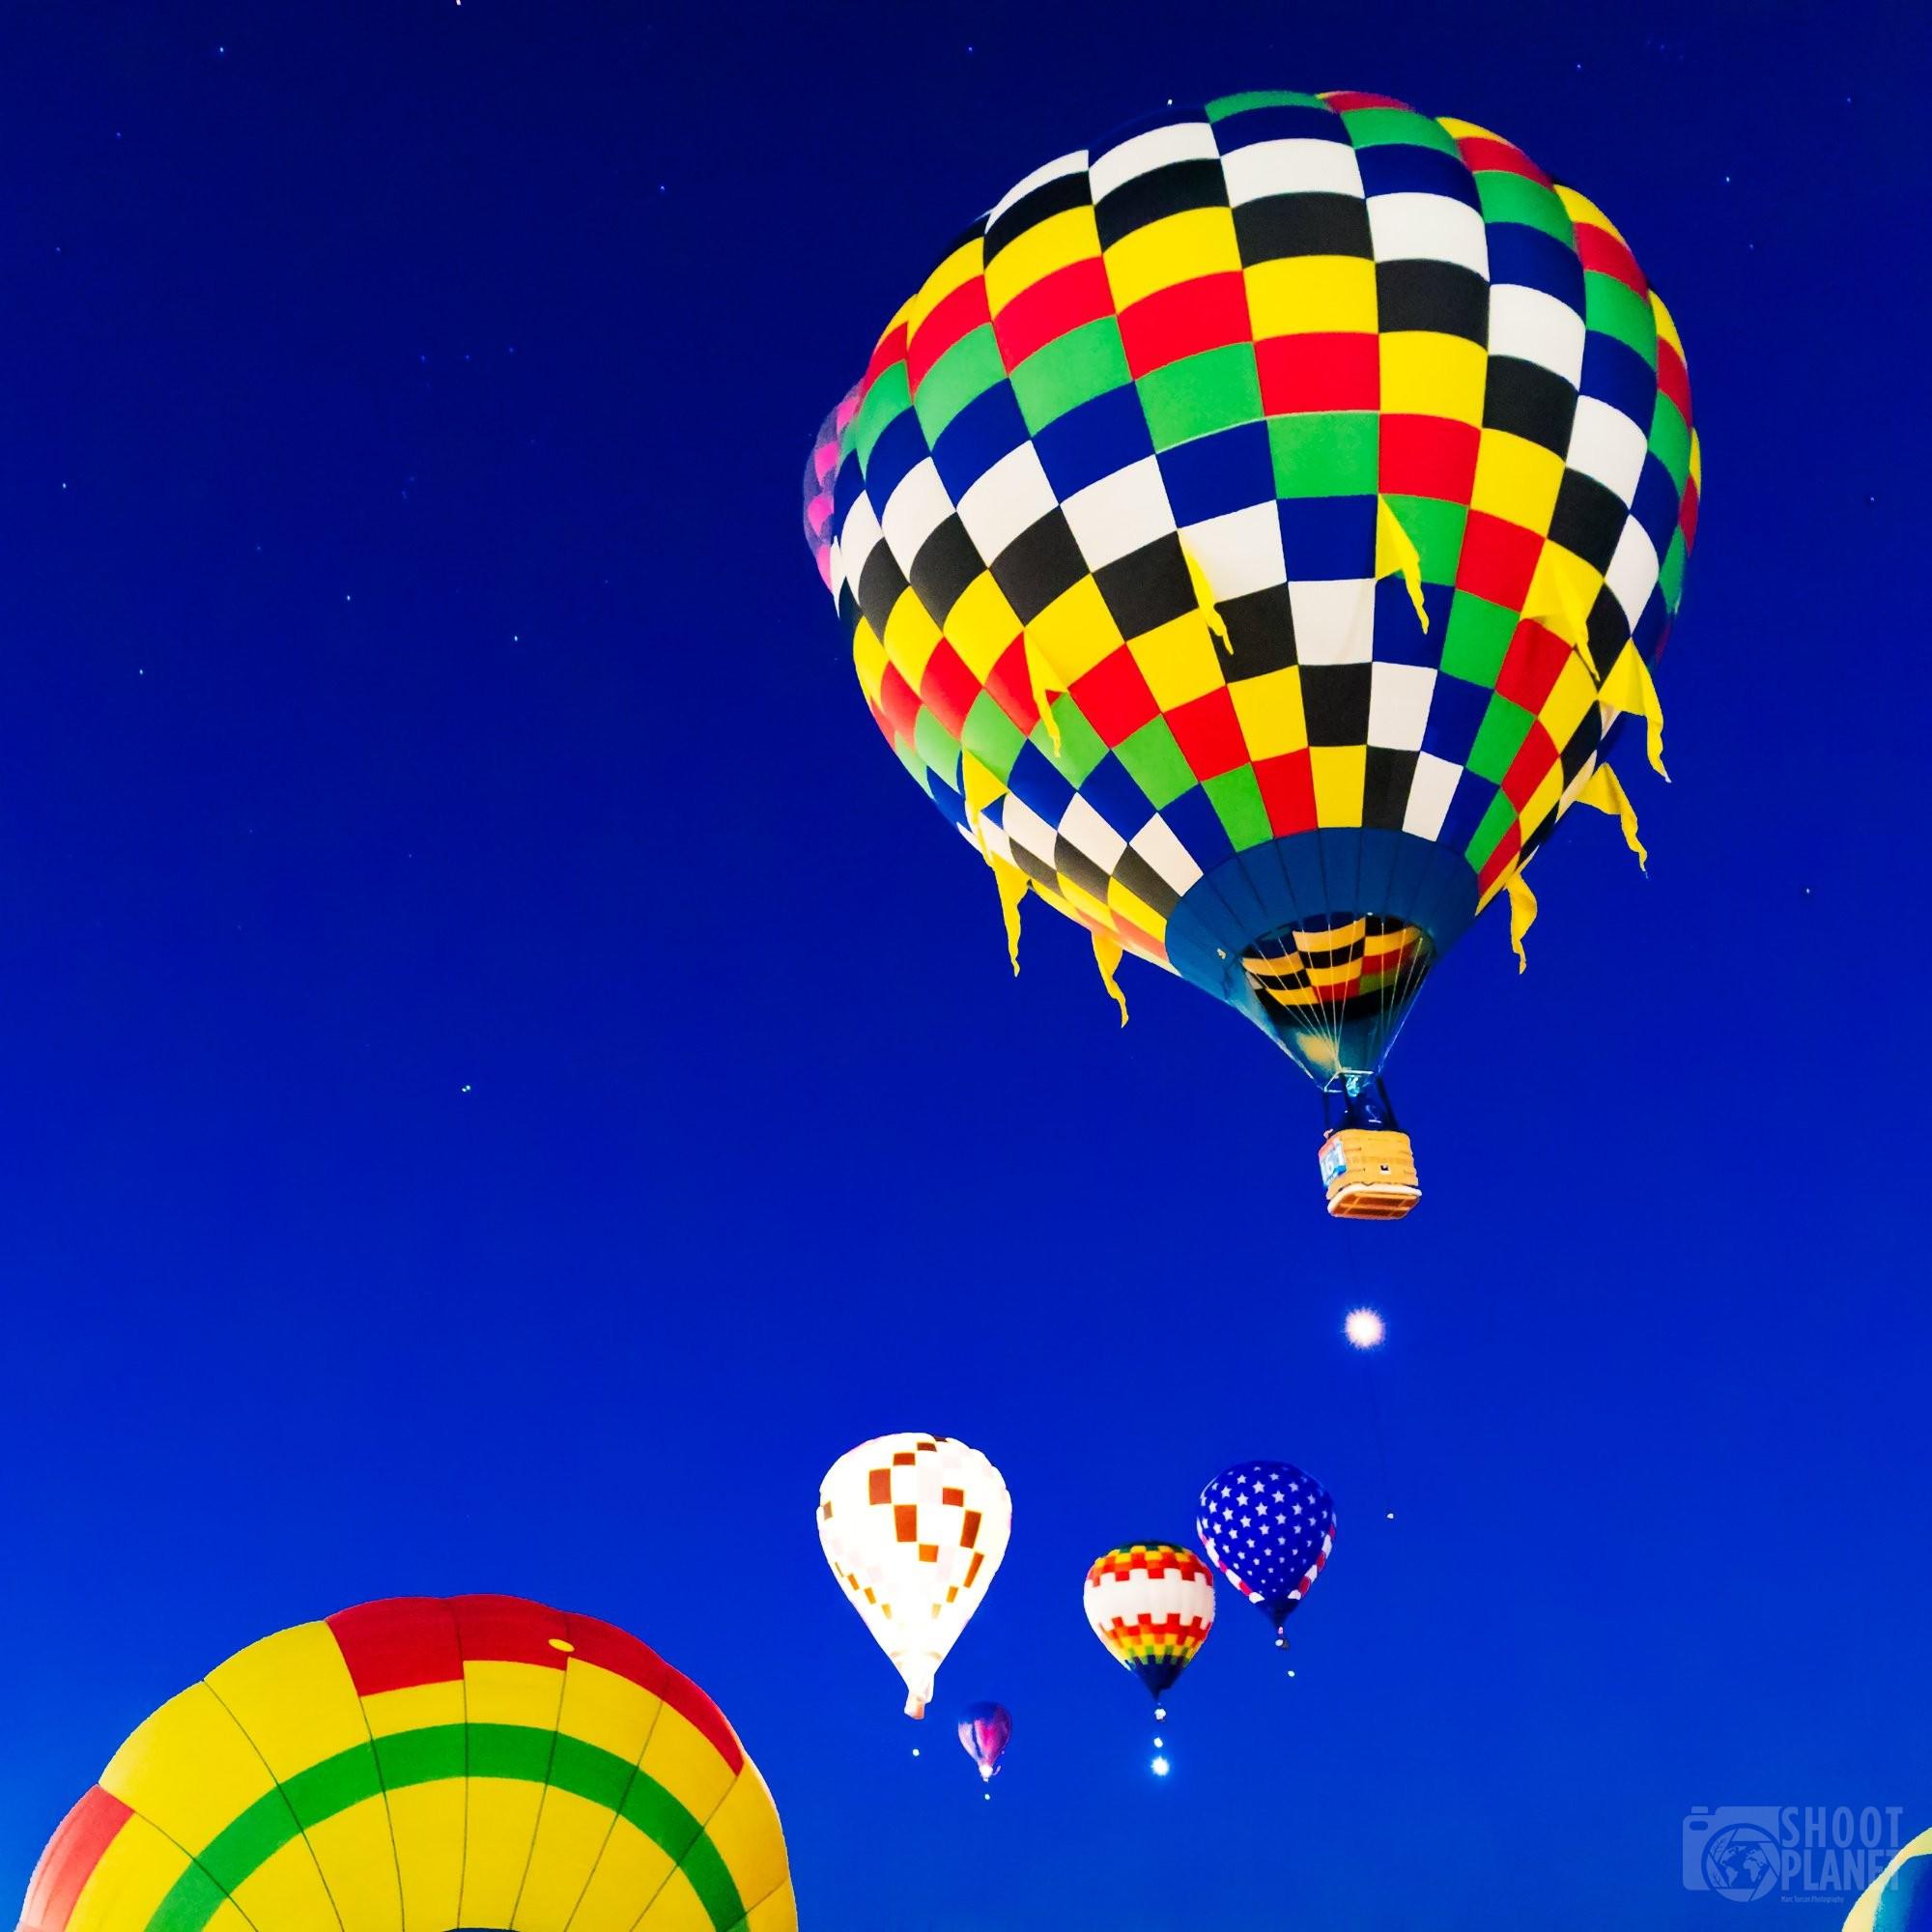 Colorful balloons in starry sky, Albuquerque USA